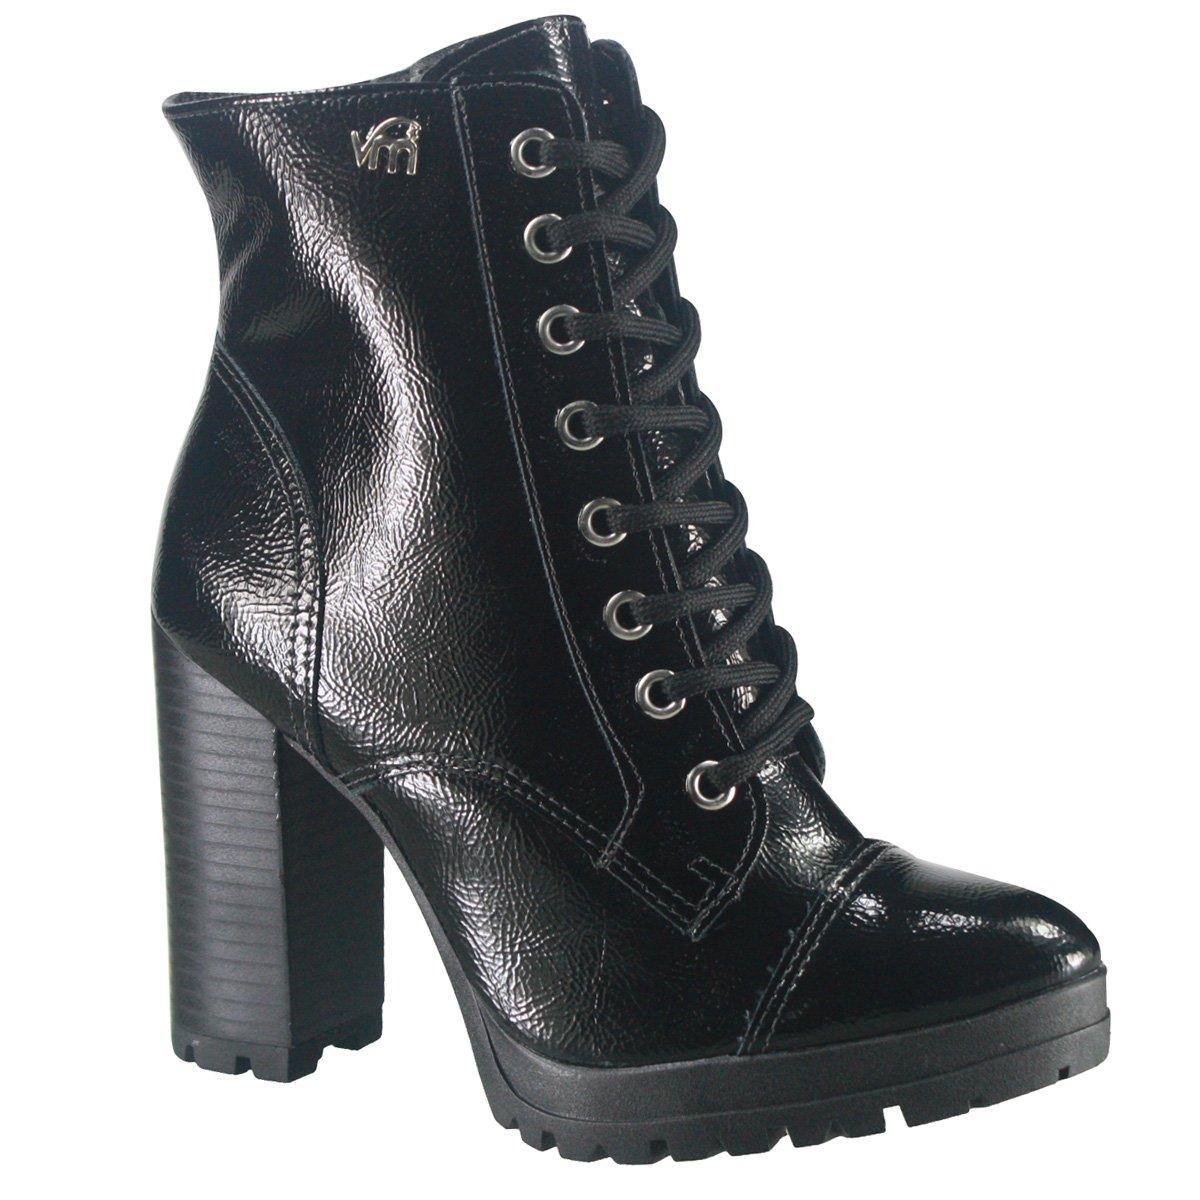 2d610a076 Bota Ankle Boot Via Marte 18-903 - Preto (Verniz Glamour) - Botas ...